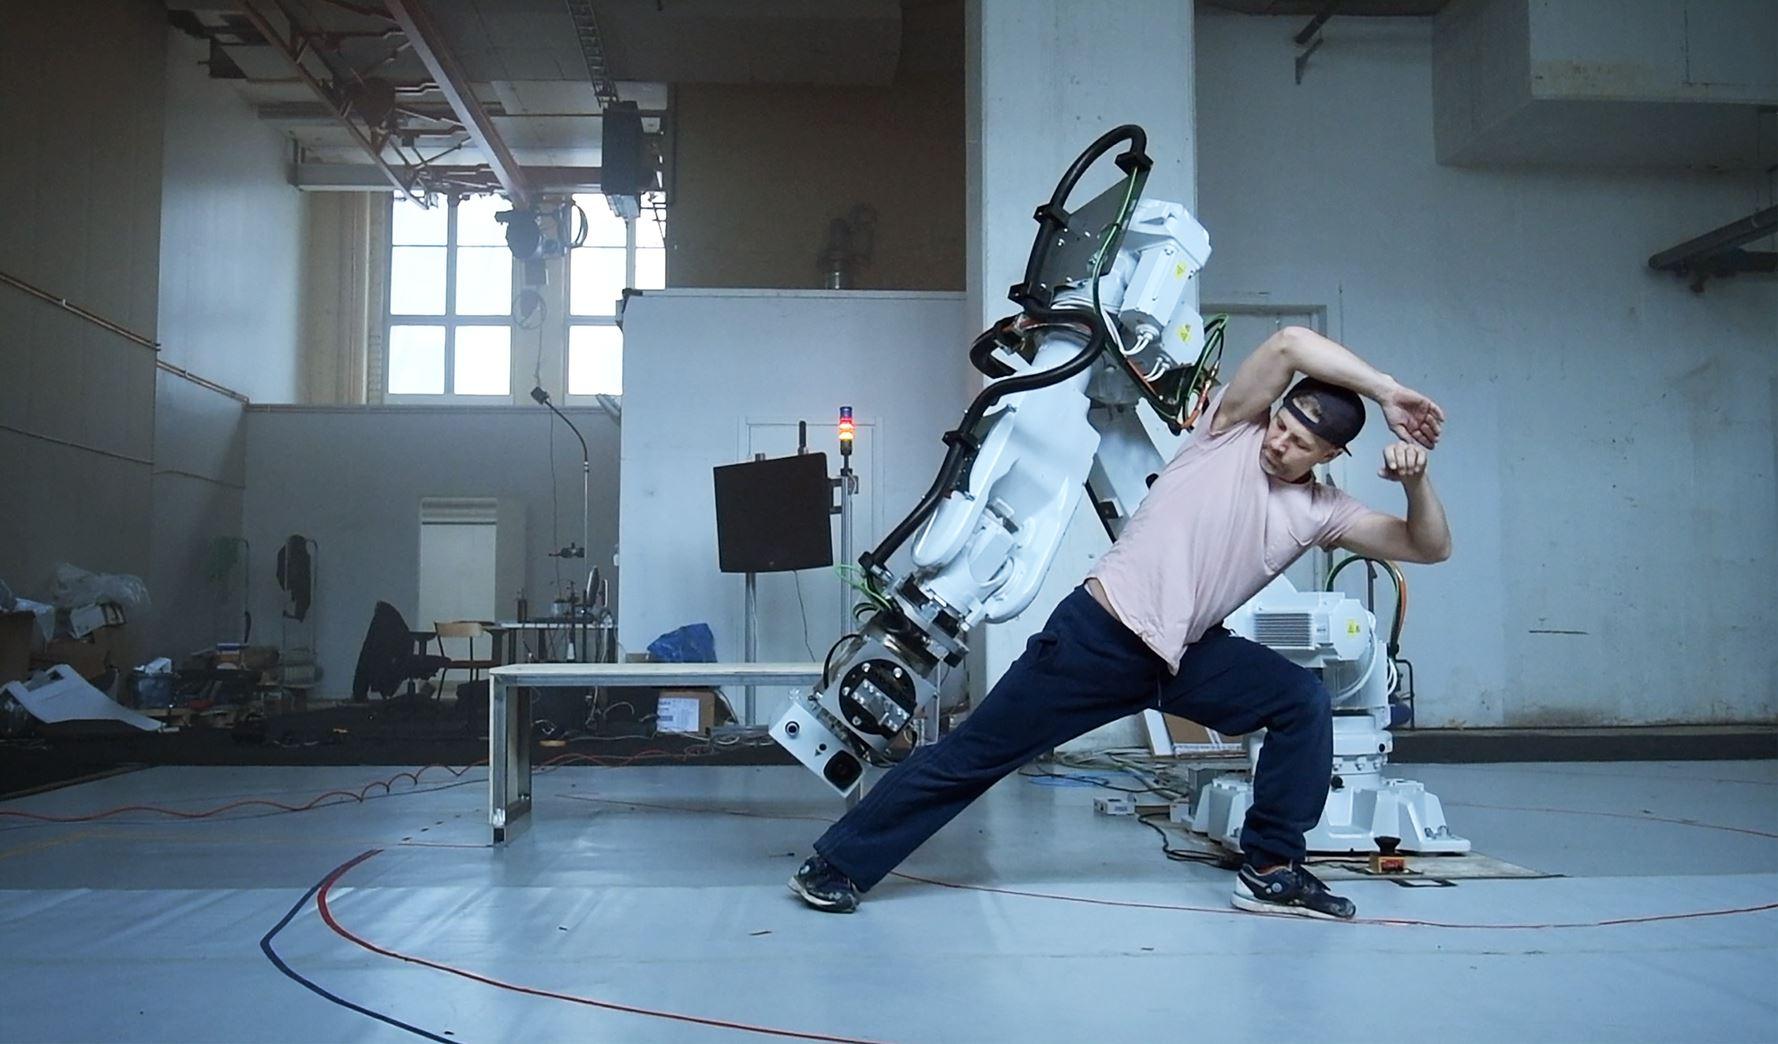 Roboten som tar over hemtjansten